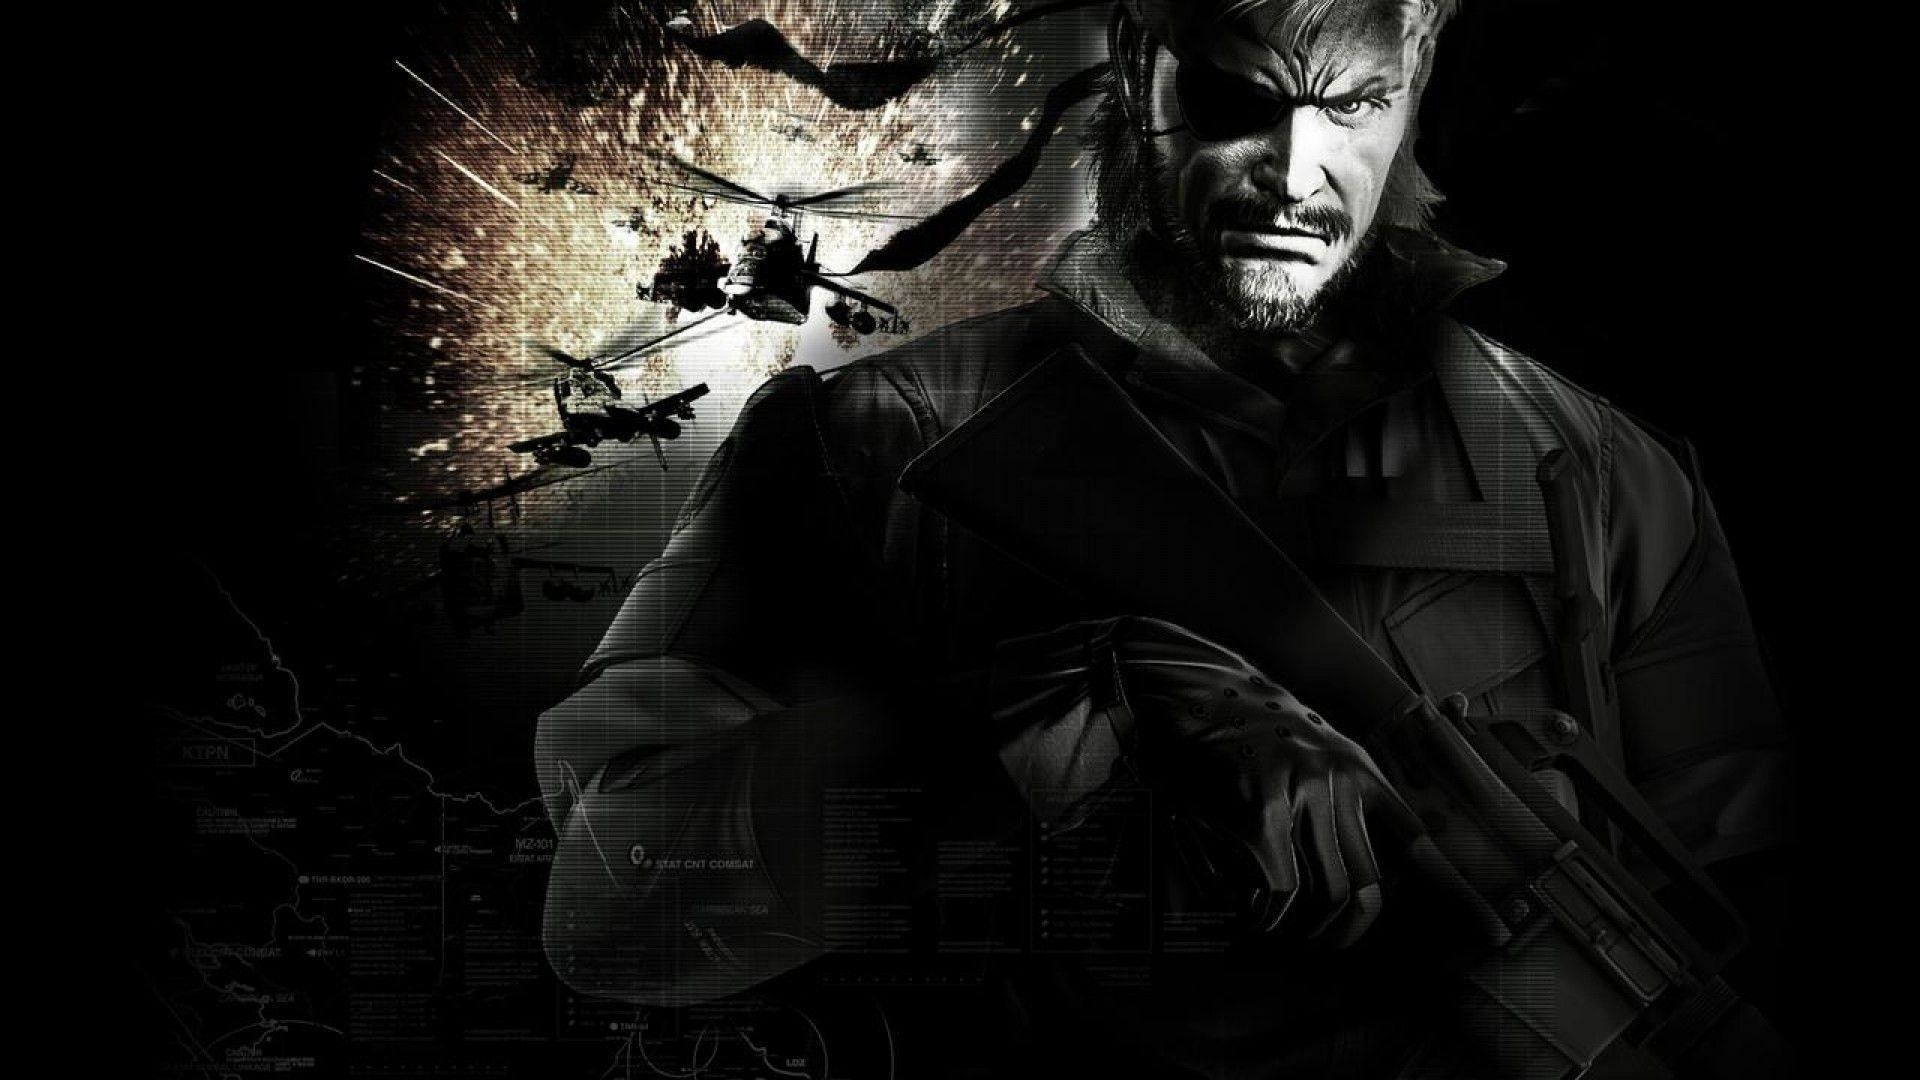 Metal Gear Solid 4 Wallpaper 1080p